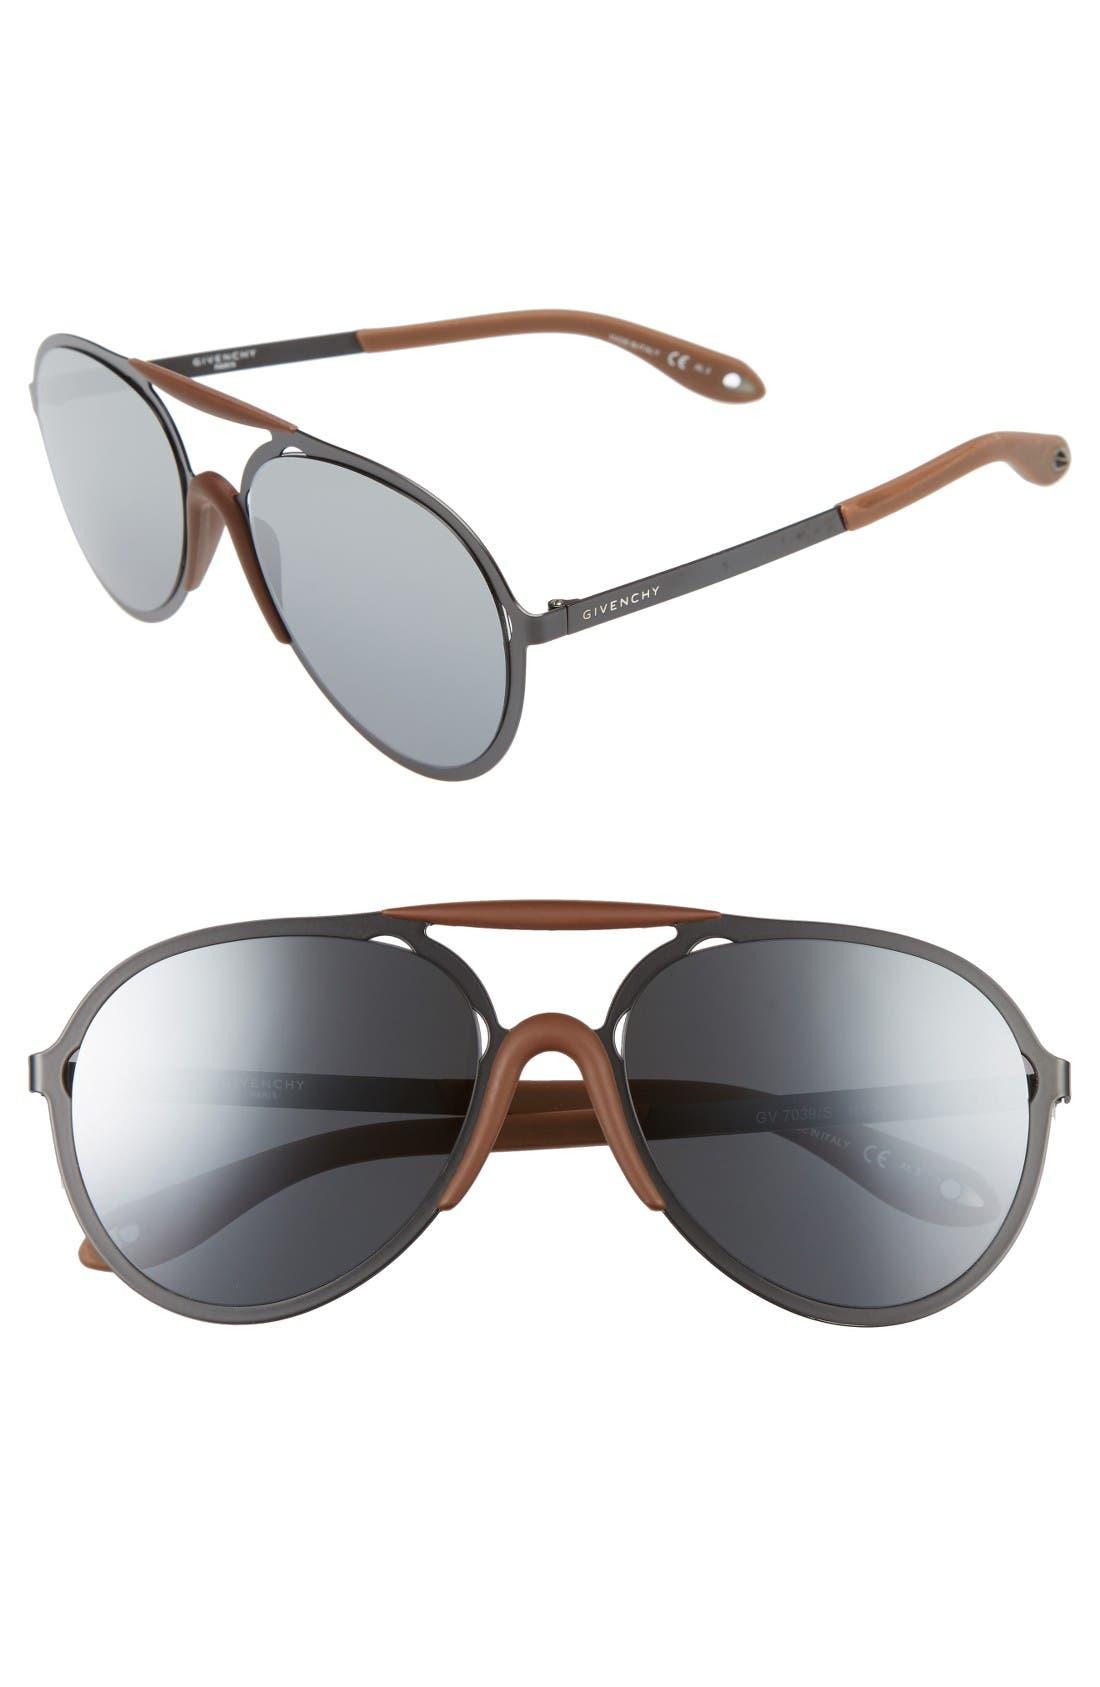 Main Image - Givenchy 57mm Sunglasses